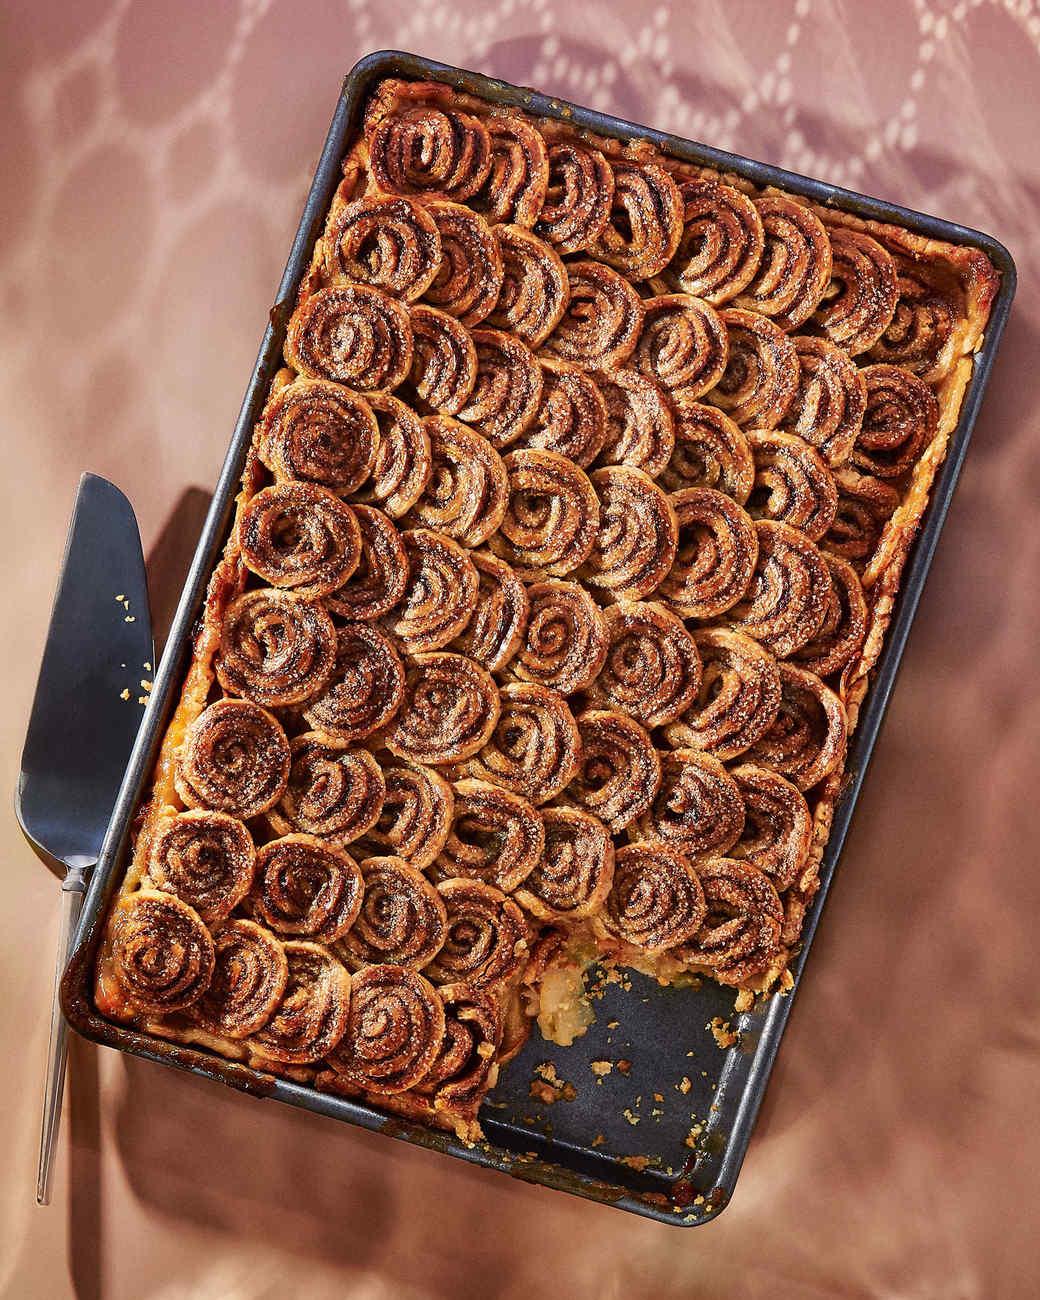 How to Make a Cinnamon-Sugar Shingled Piecrust